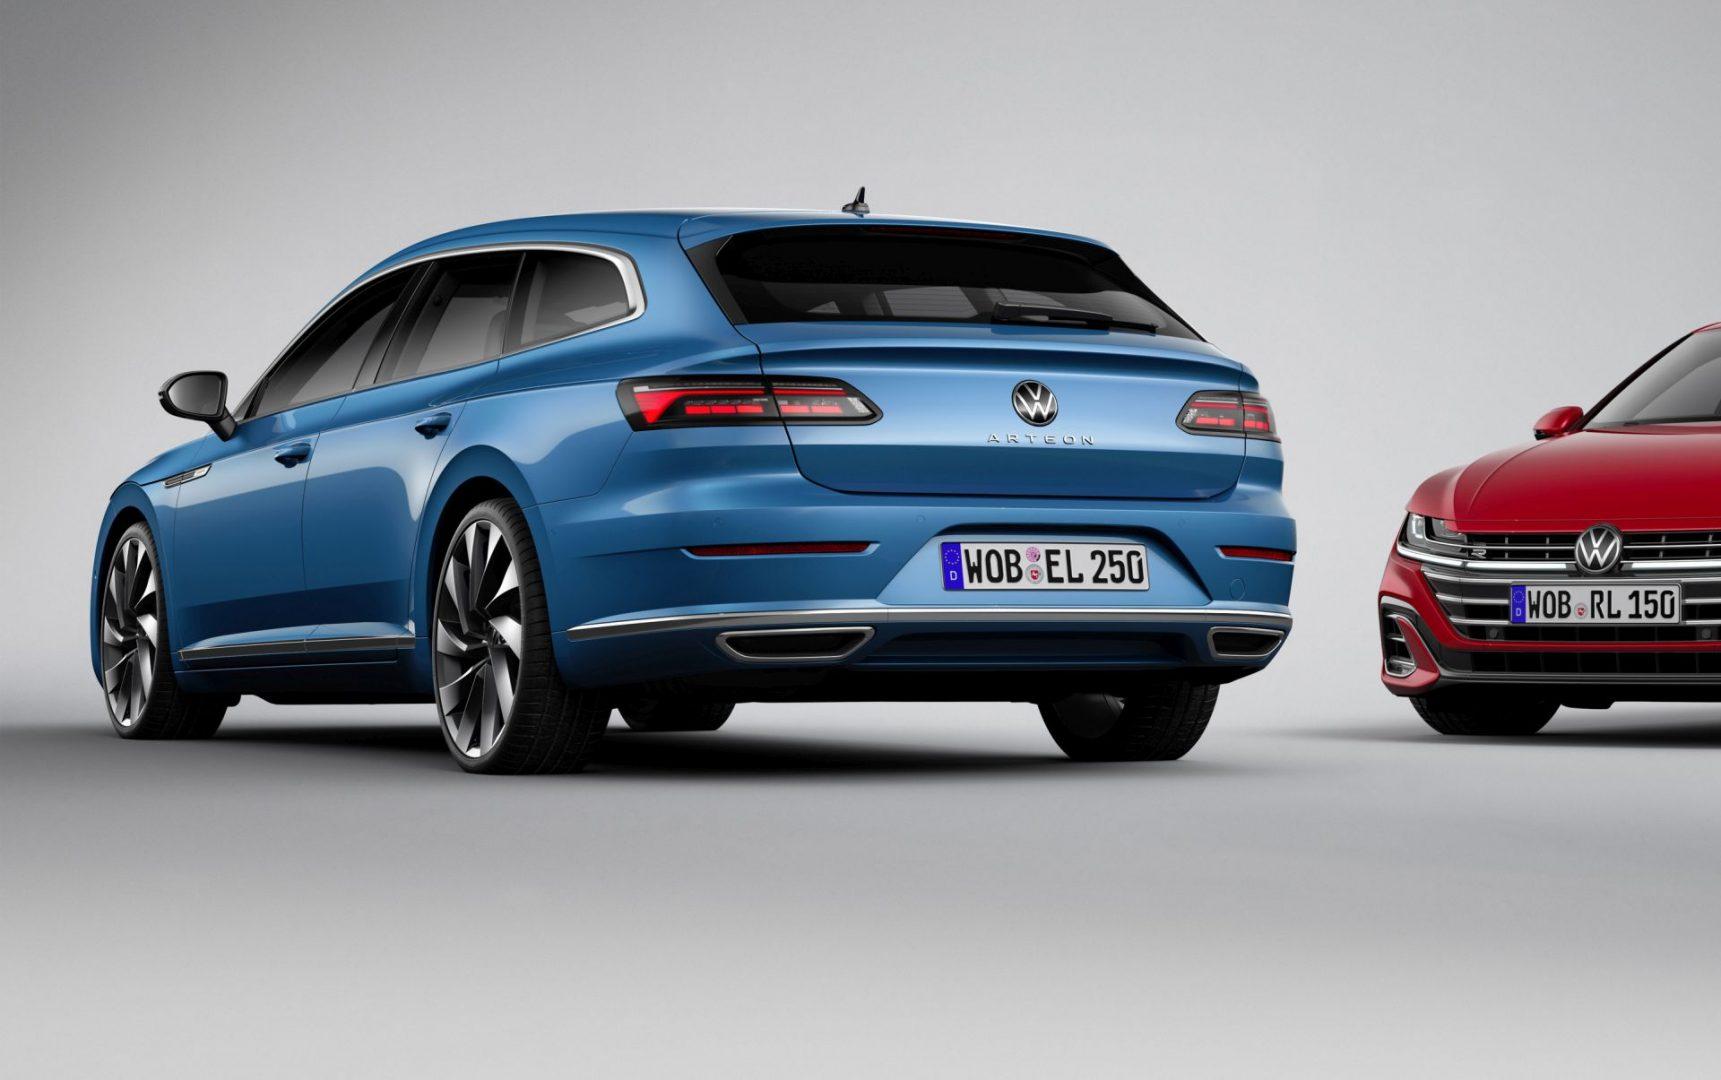 Predstavljen je Volkswagen Arteon Shooting Brake, Arteon plug-in hibrid i Arteon R